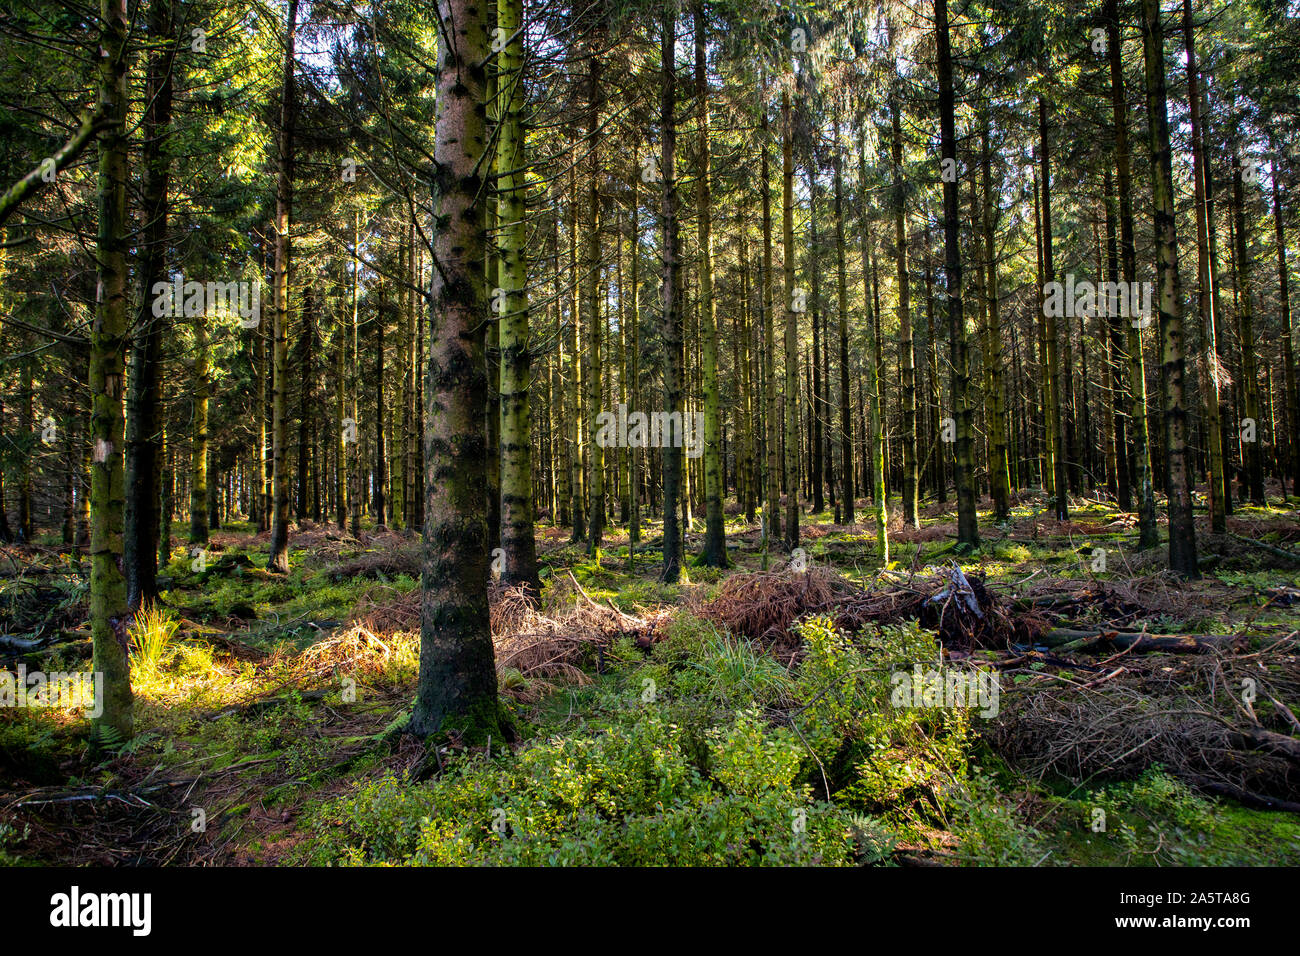 Belgium, Wallonia, the High Fens, high moor, in the Eifel and Ardennes region, High Fens Eifel Nature Park, northeast of Baraque Michel, Stock Photo